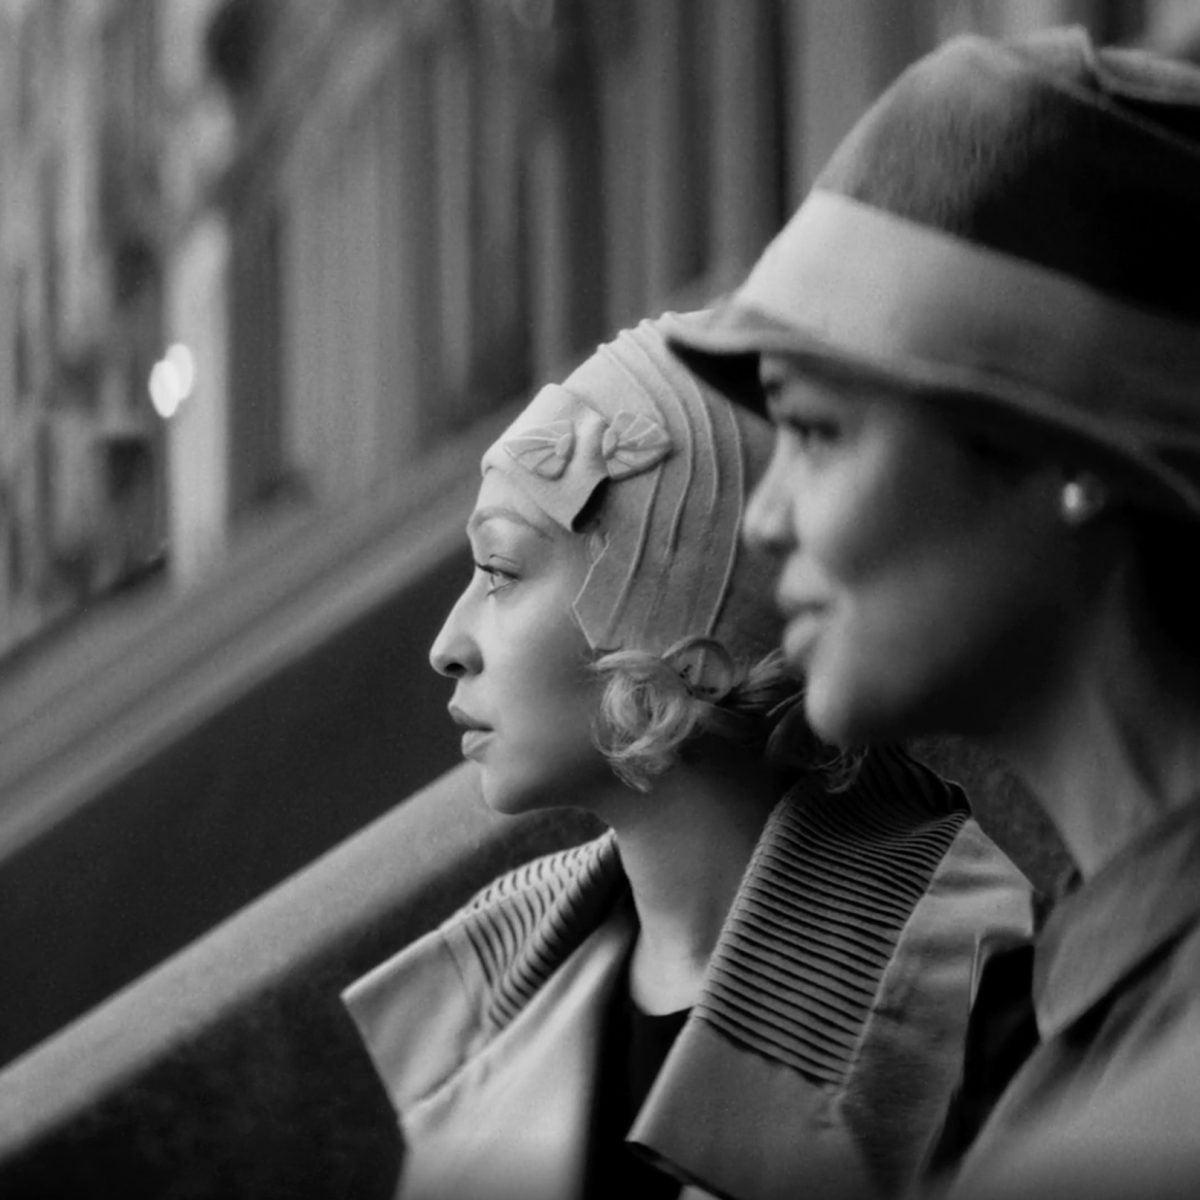 Watch the Trailer for Tessa Thompson and Ruth Negga's Netflix Drama, 'Passing'